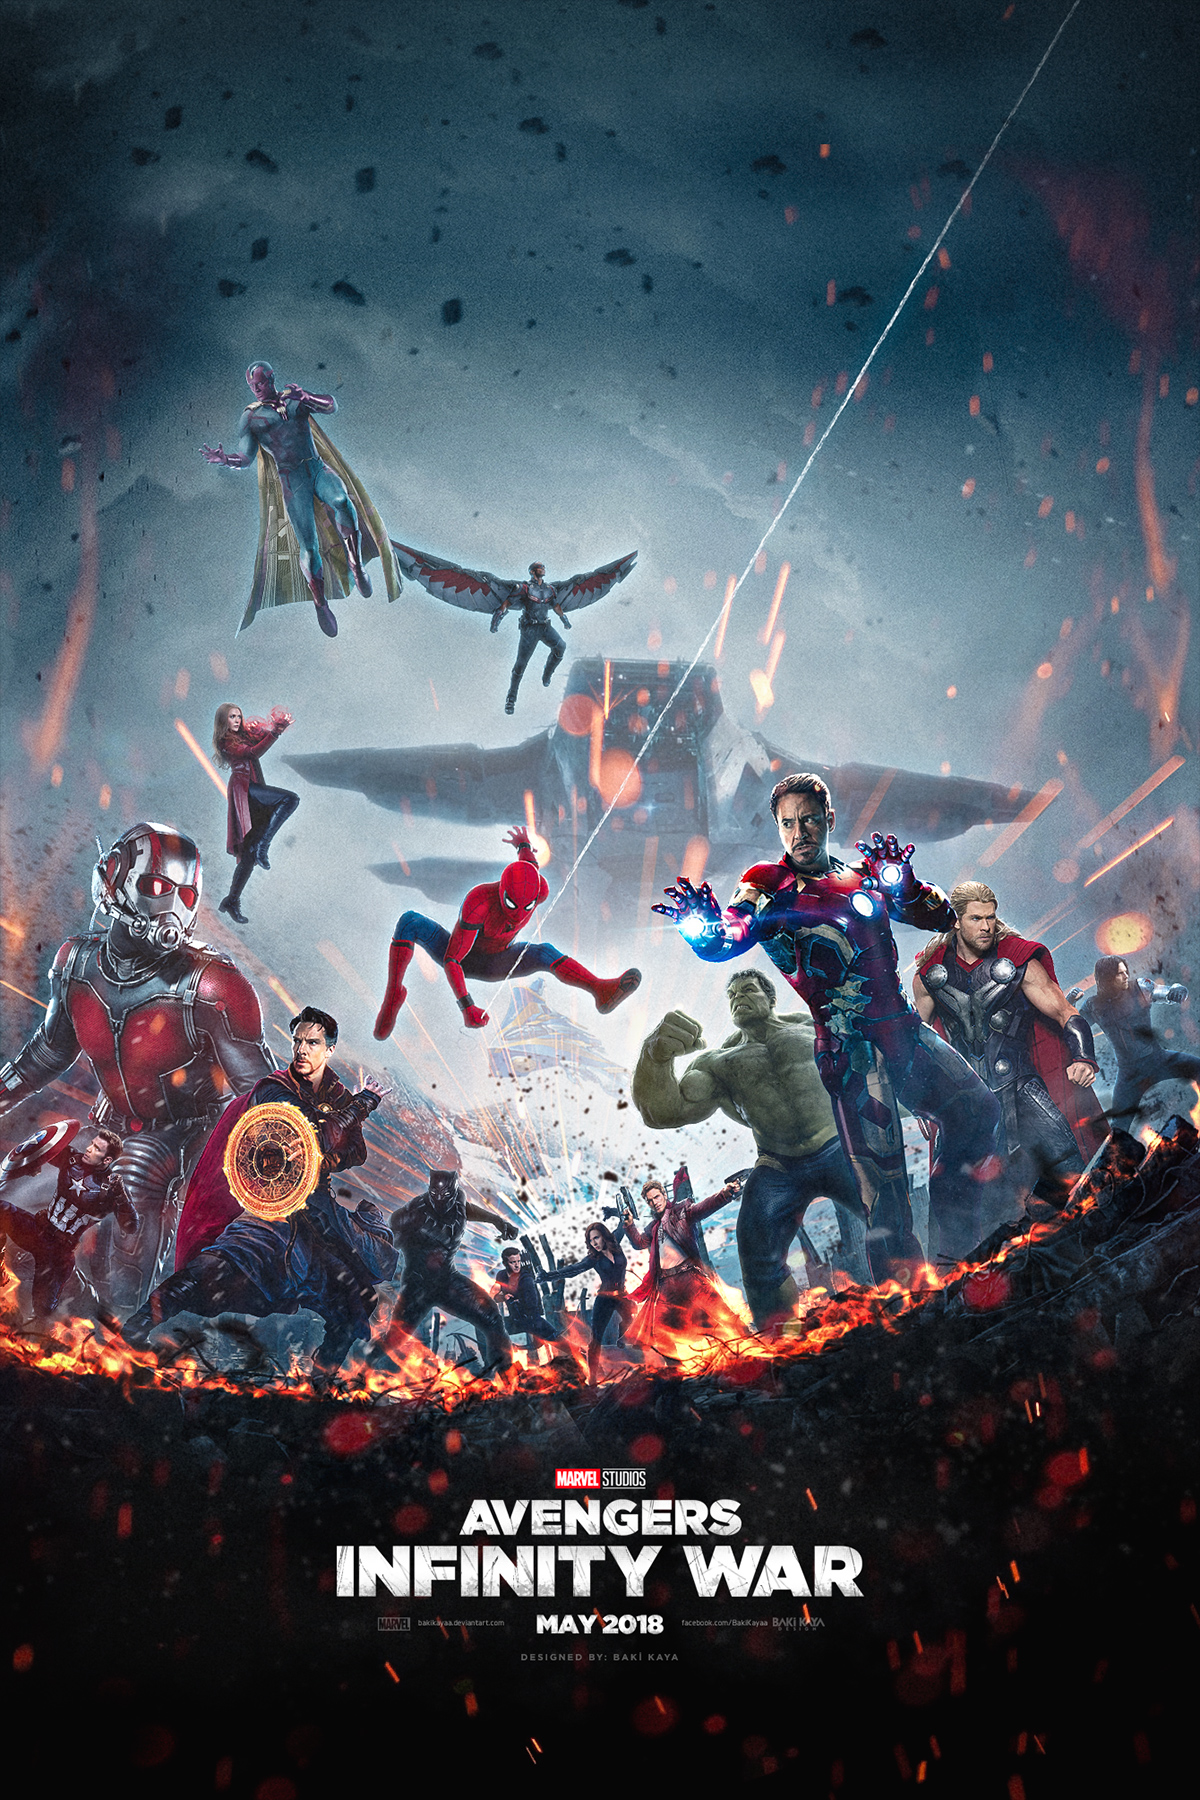 Avengers: Infinity War Poster #3 by bakikayaa